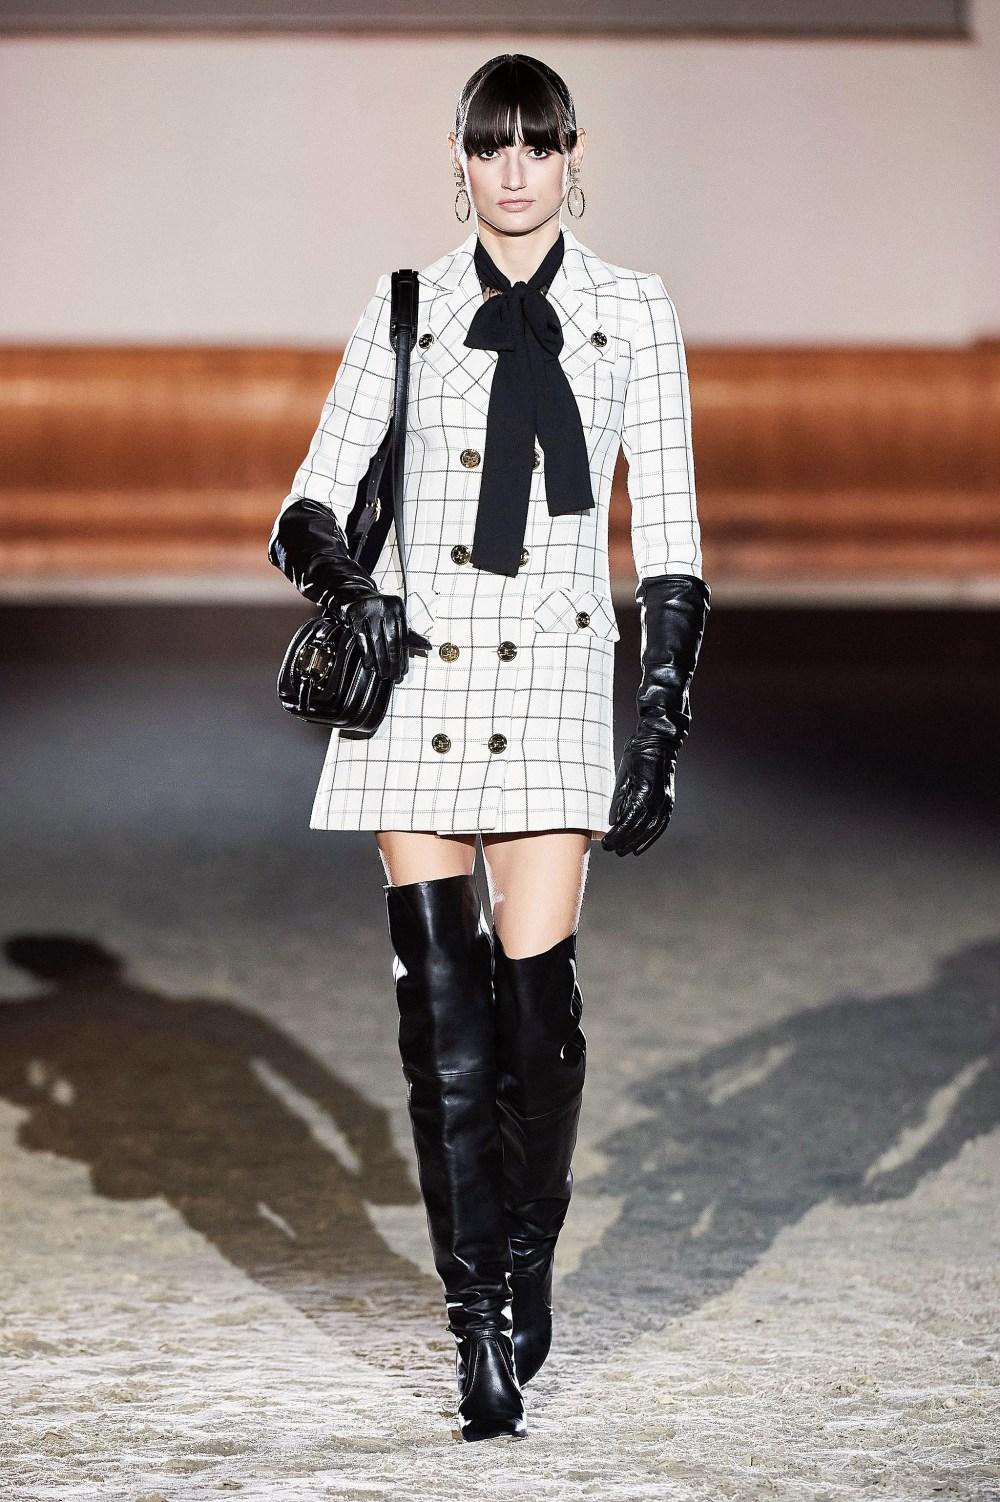 Elisabetta Franchi: Elisabetta Franchi Fall Winter 2021-22 Fashion Show Photo #42